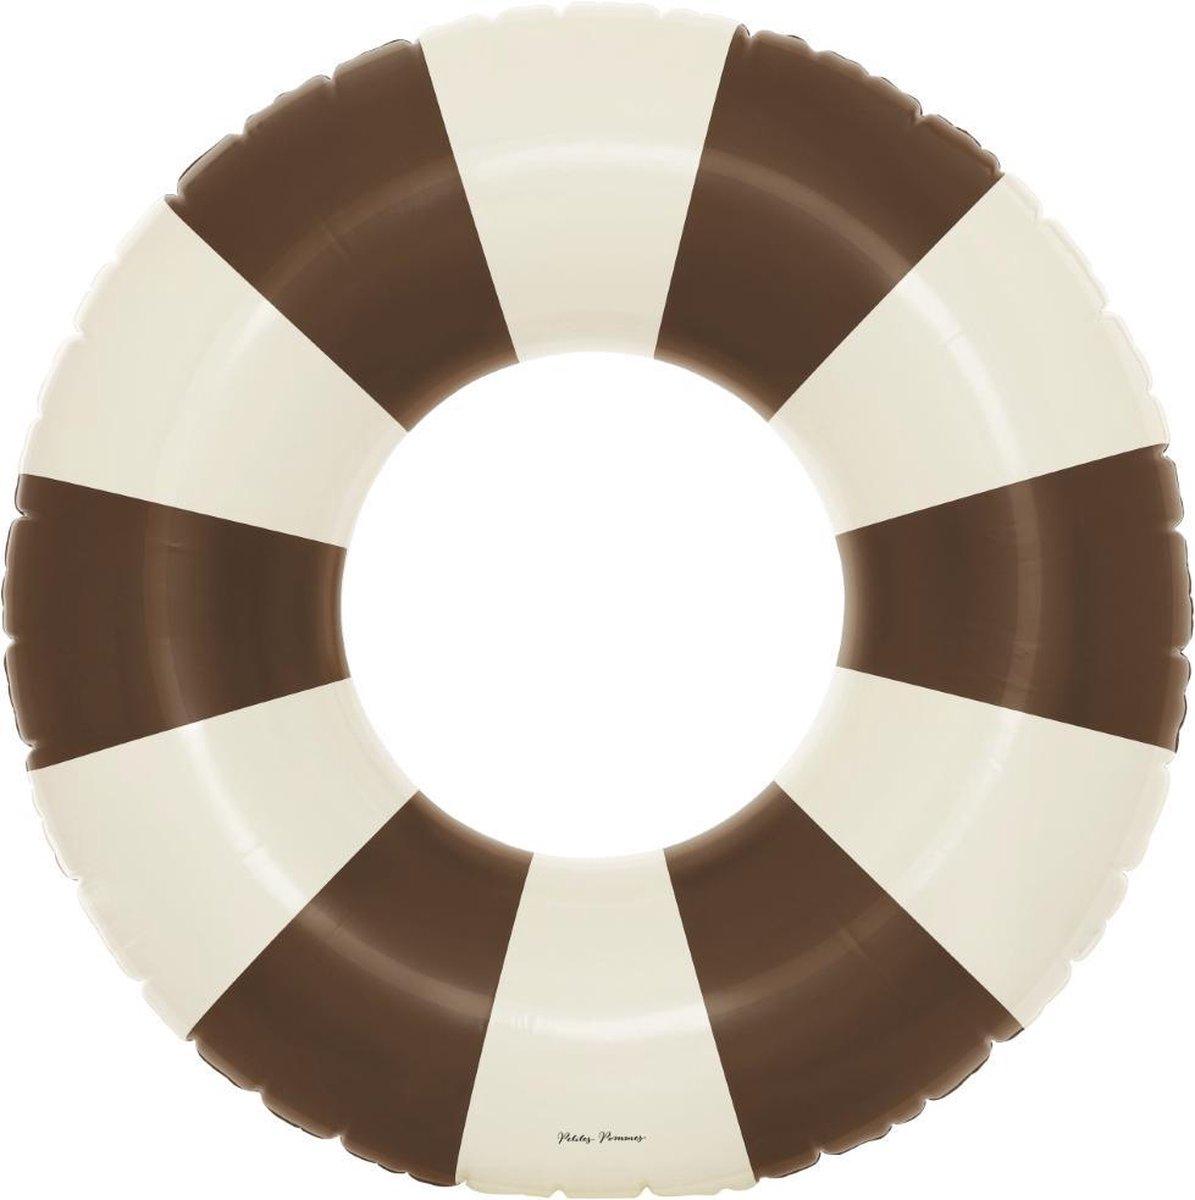 Petites Pommes Zwemring Celine Grand Float Charleston Tan - Zwemband - ø 120cm - 6+ jaar